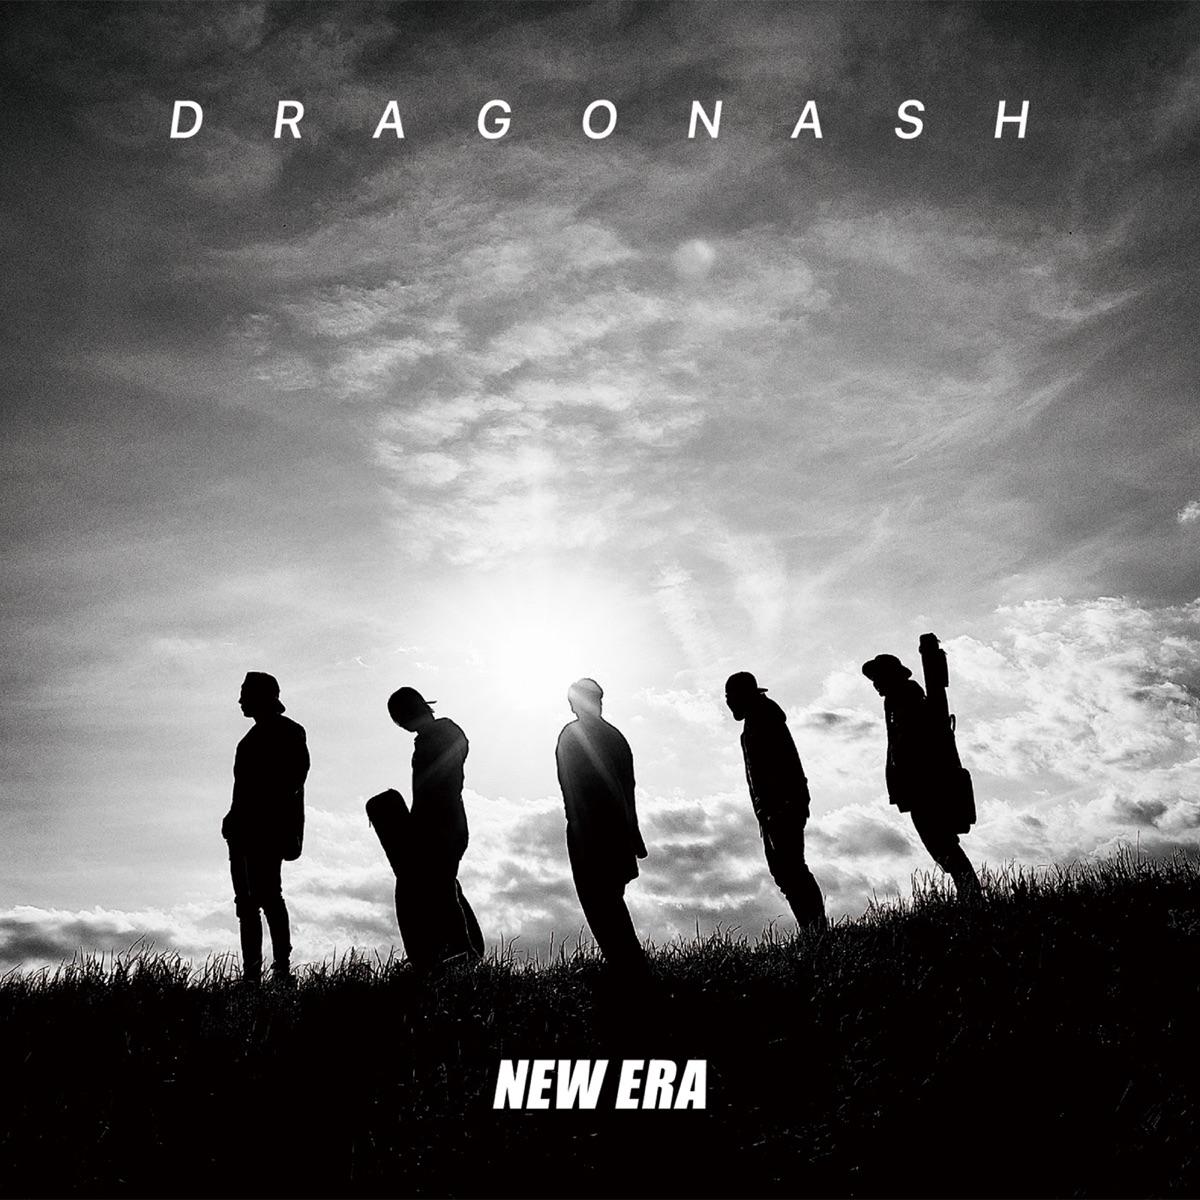 『Dragon Ash - ダイアログ』収録の『NEW ERA』ジャケット